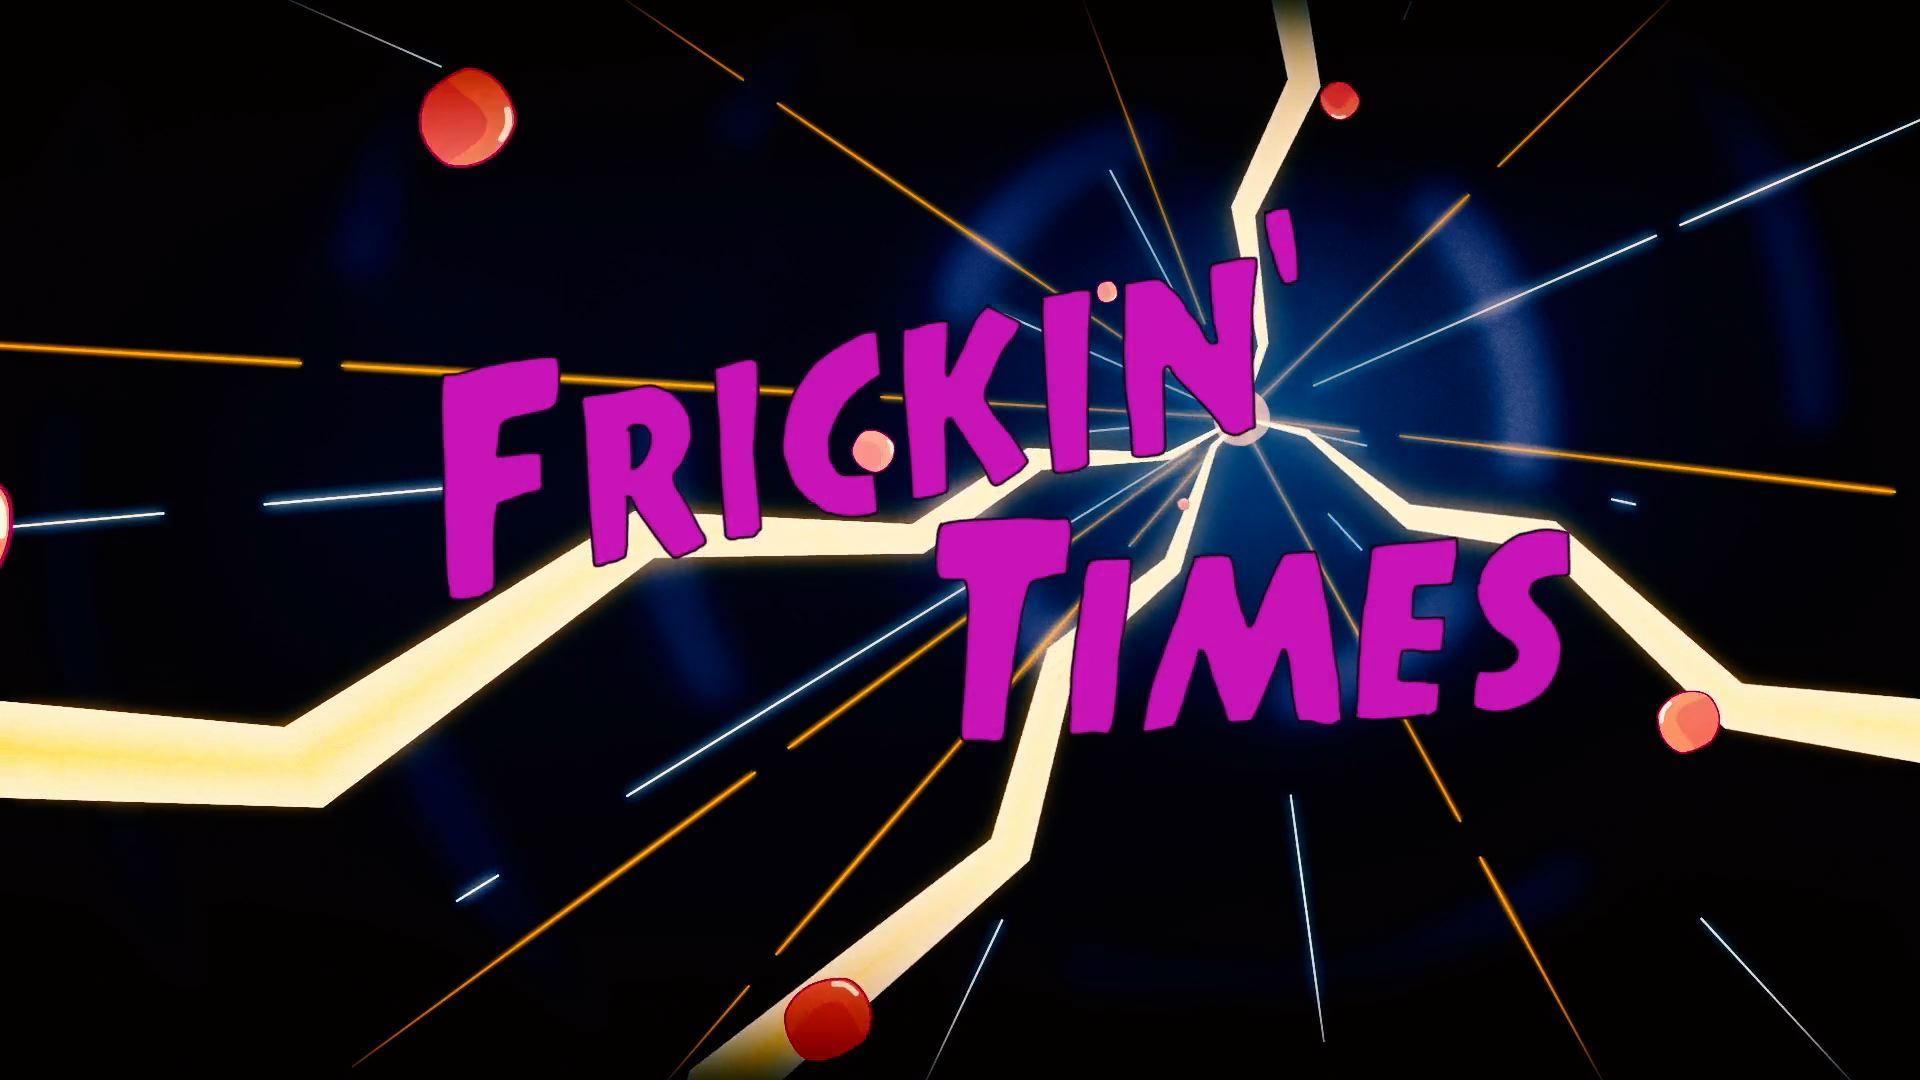 Frickin' Times